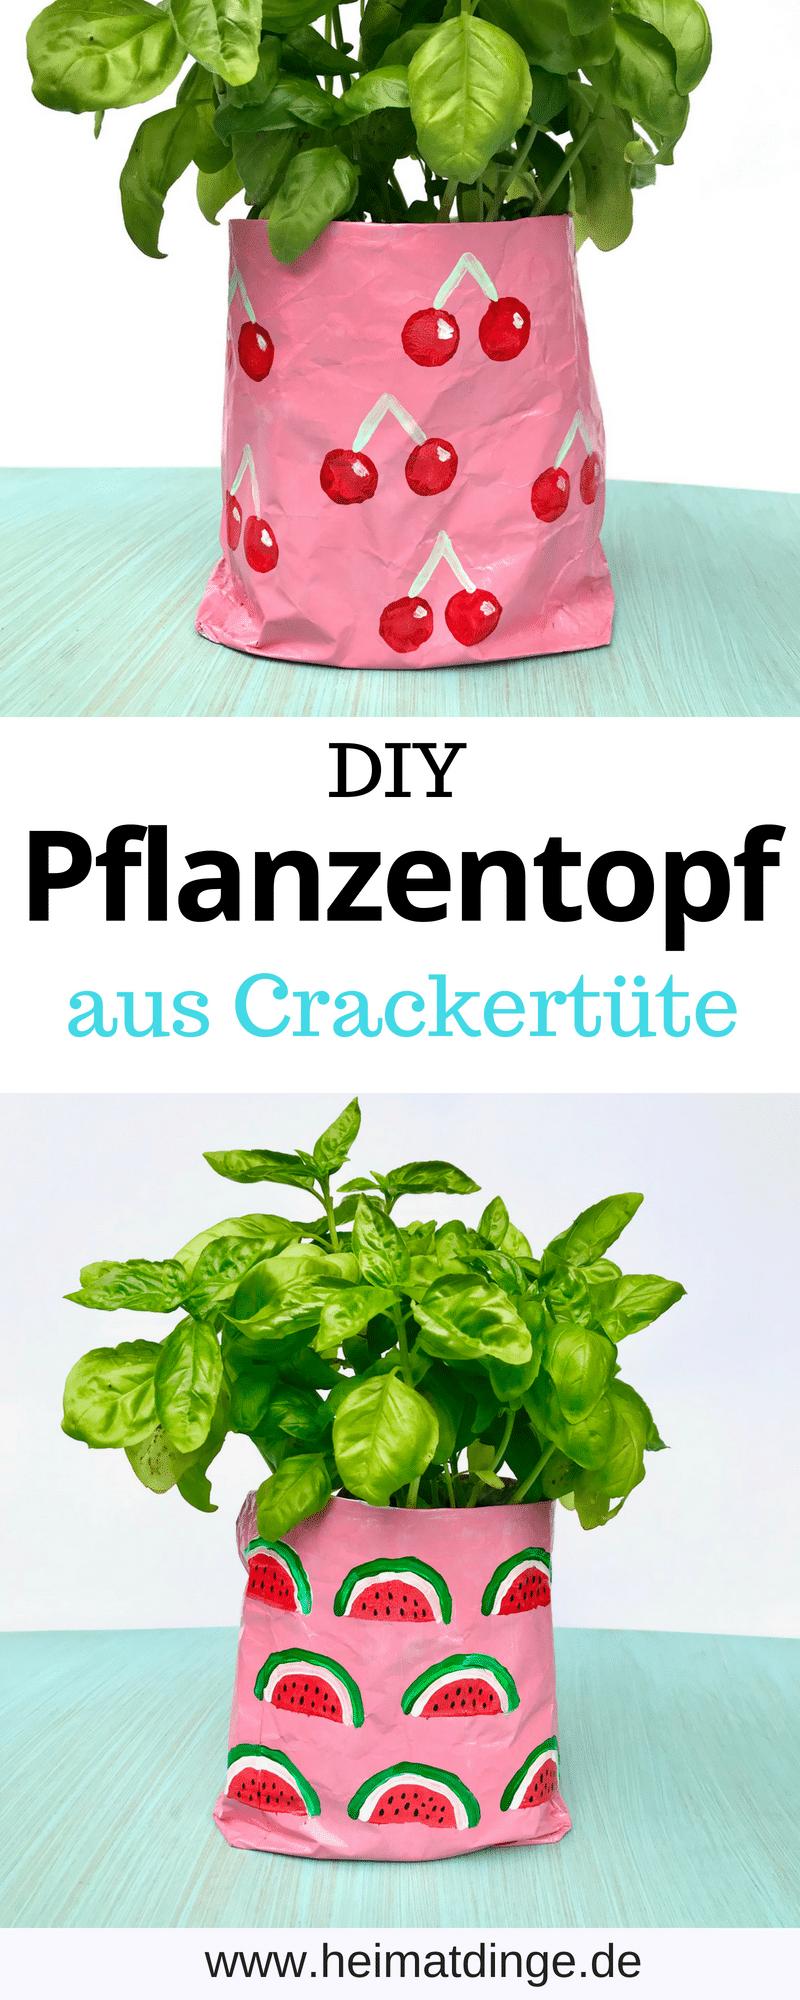 Geschenk-selbermachen-Pflanzentopf-Verpackung-upcycling-idee-diy-Anleitung